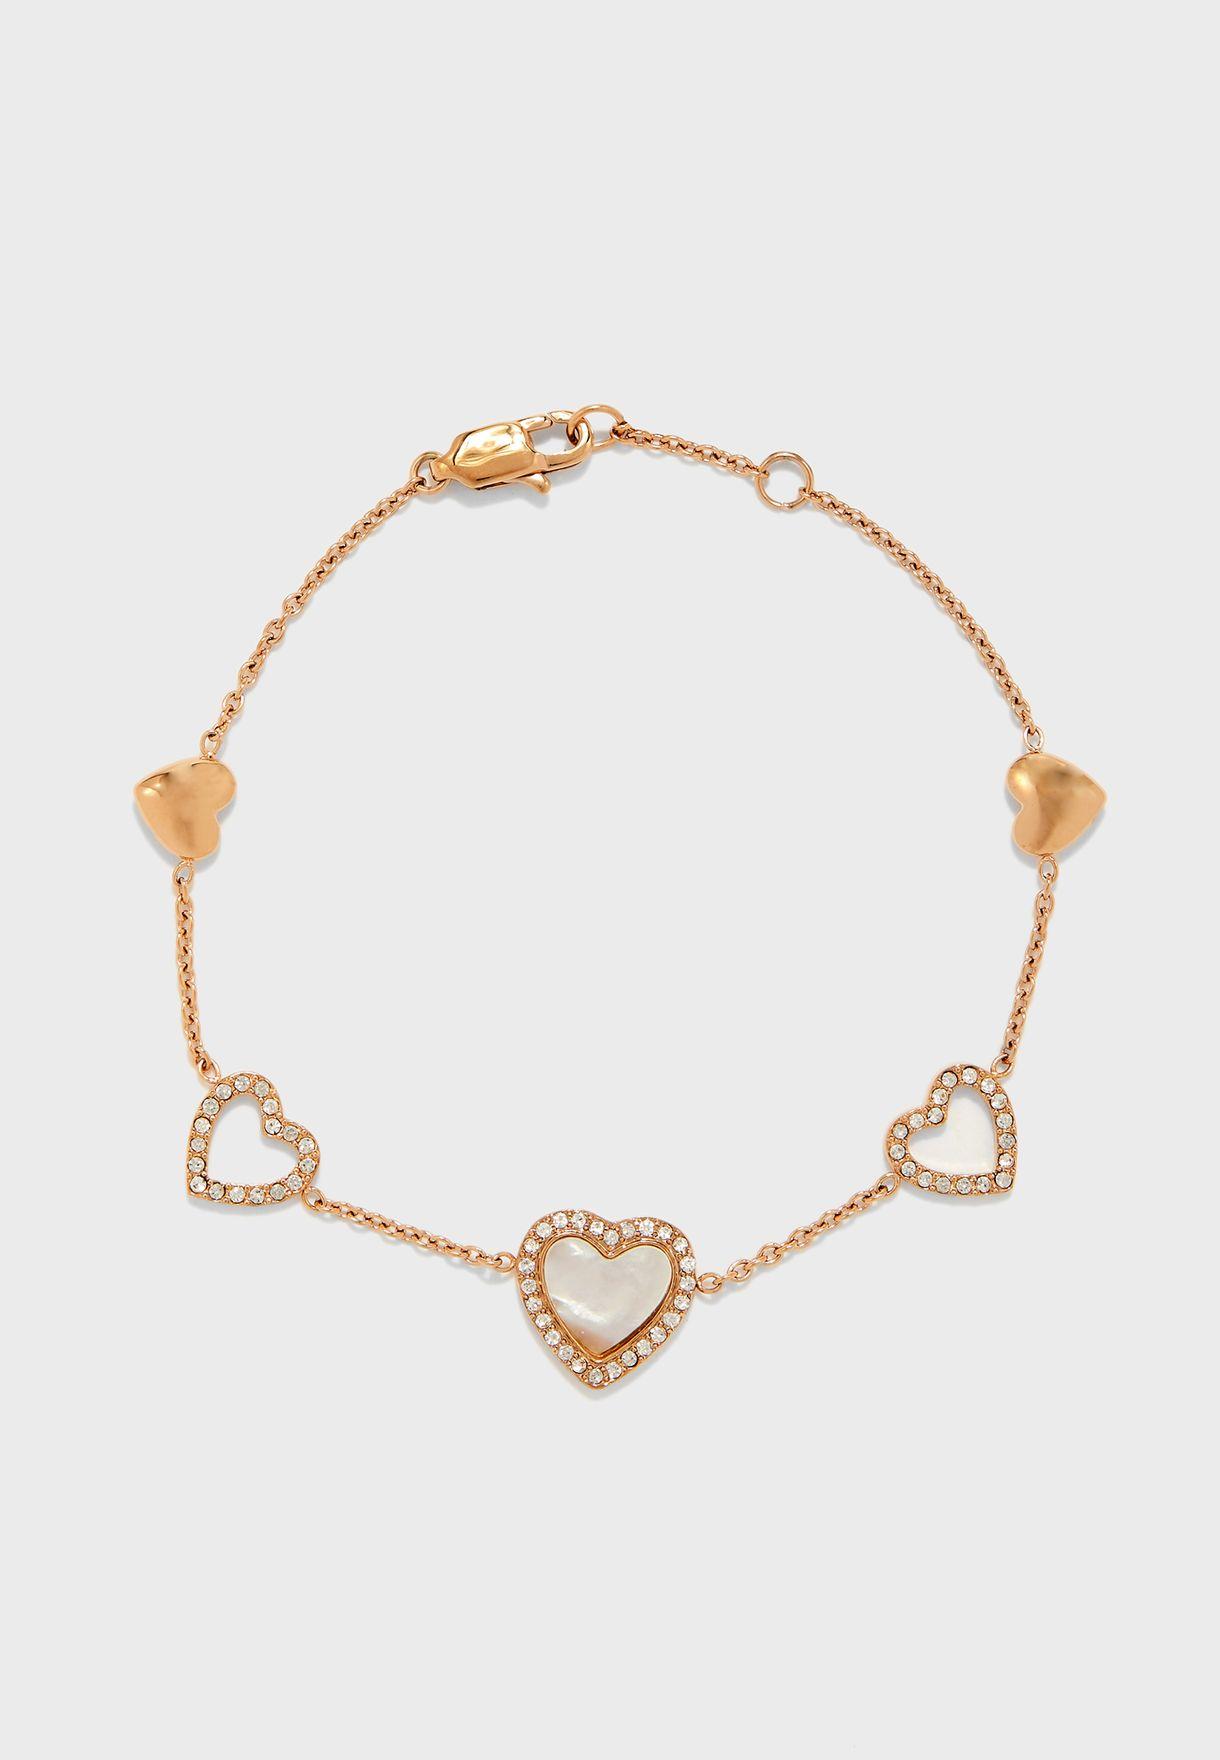 Hearts To You Bracelet